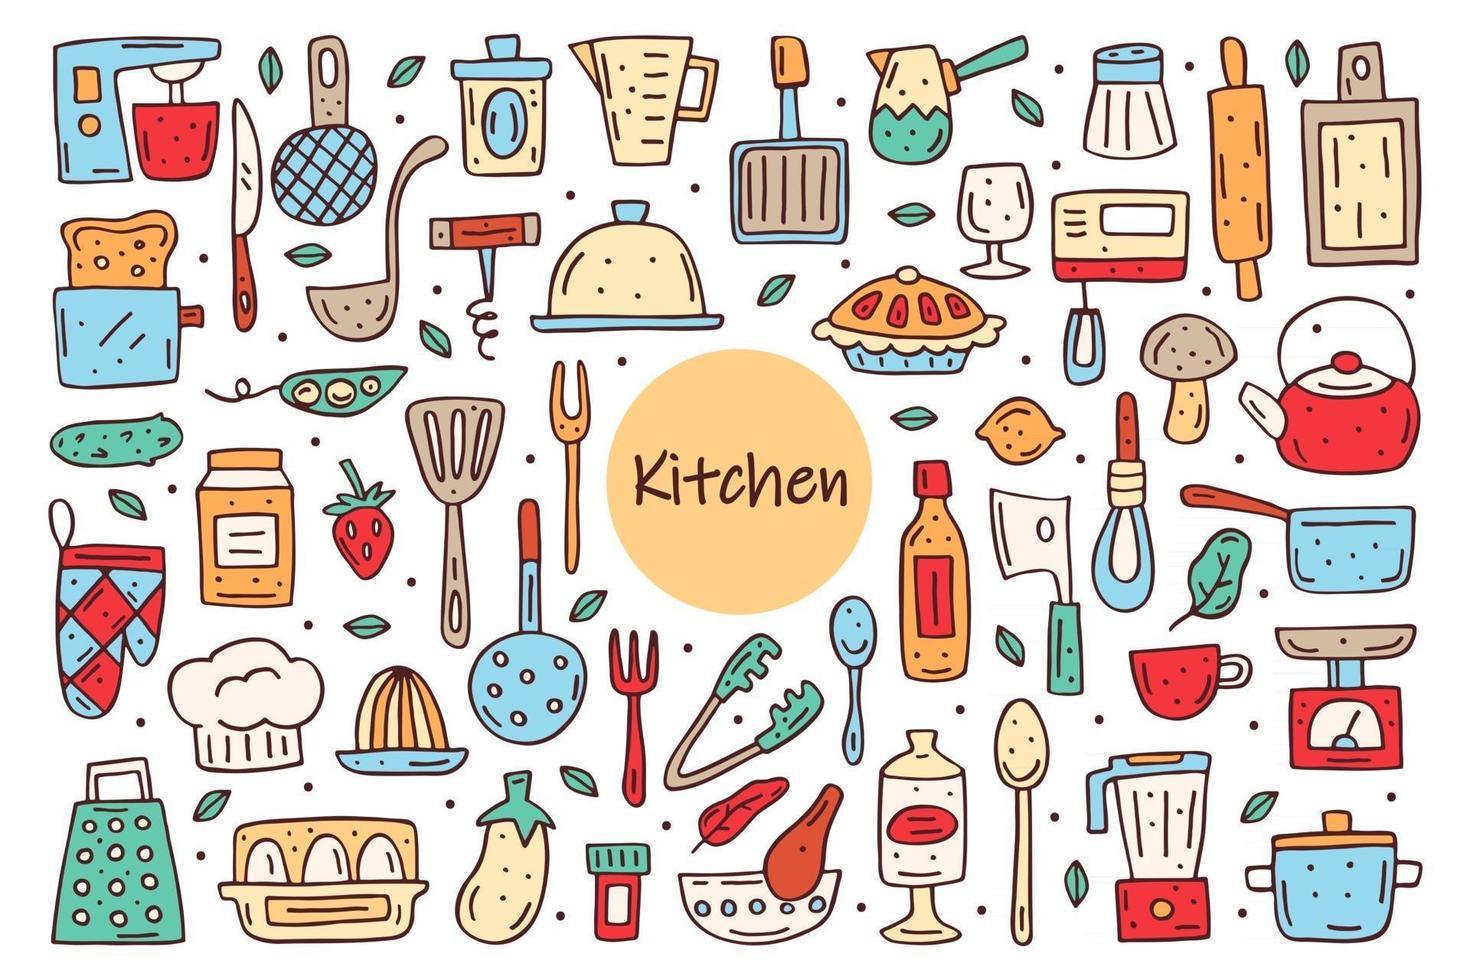 Kitchen elements cute doodle hand drawn vector clipart